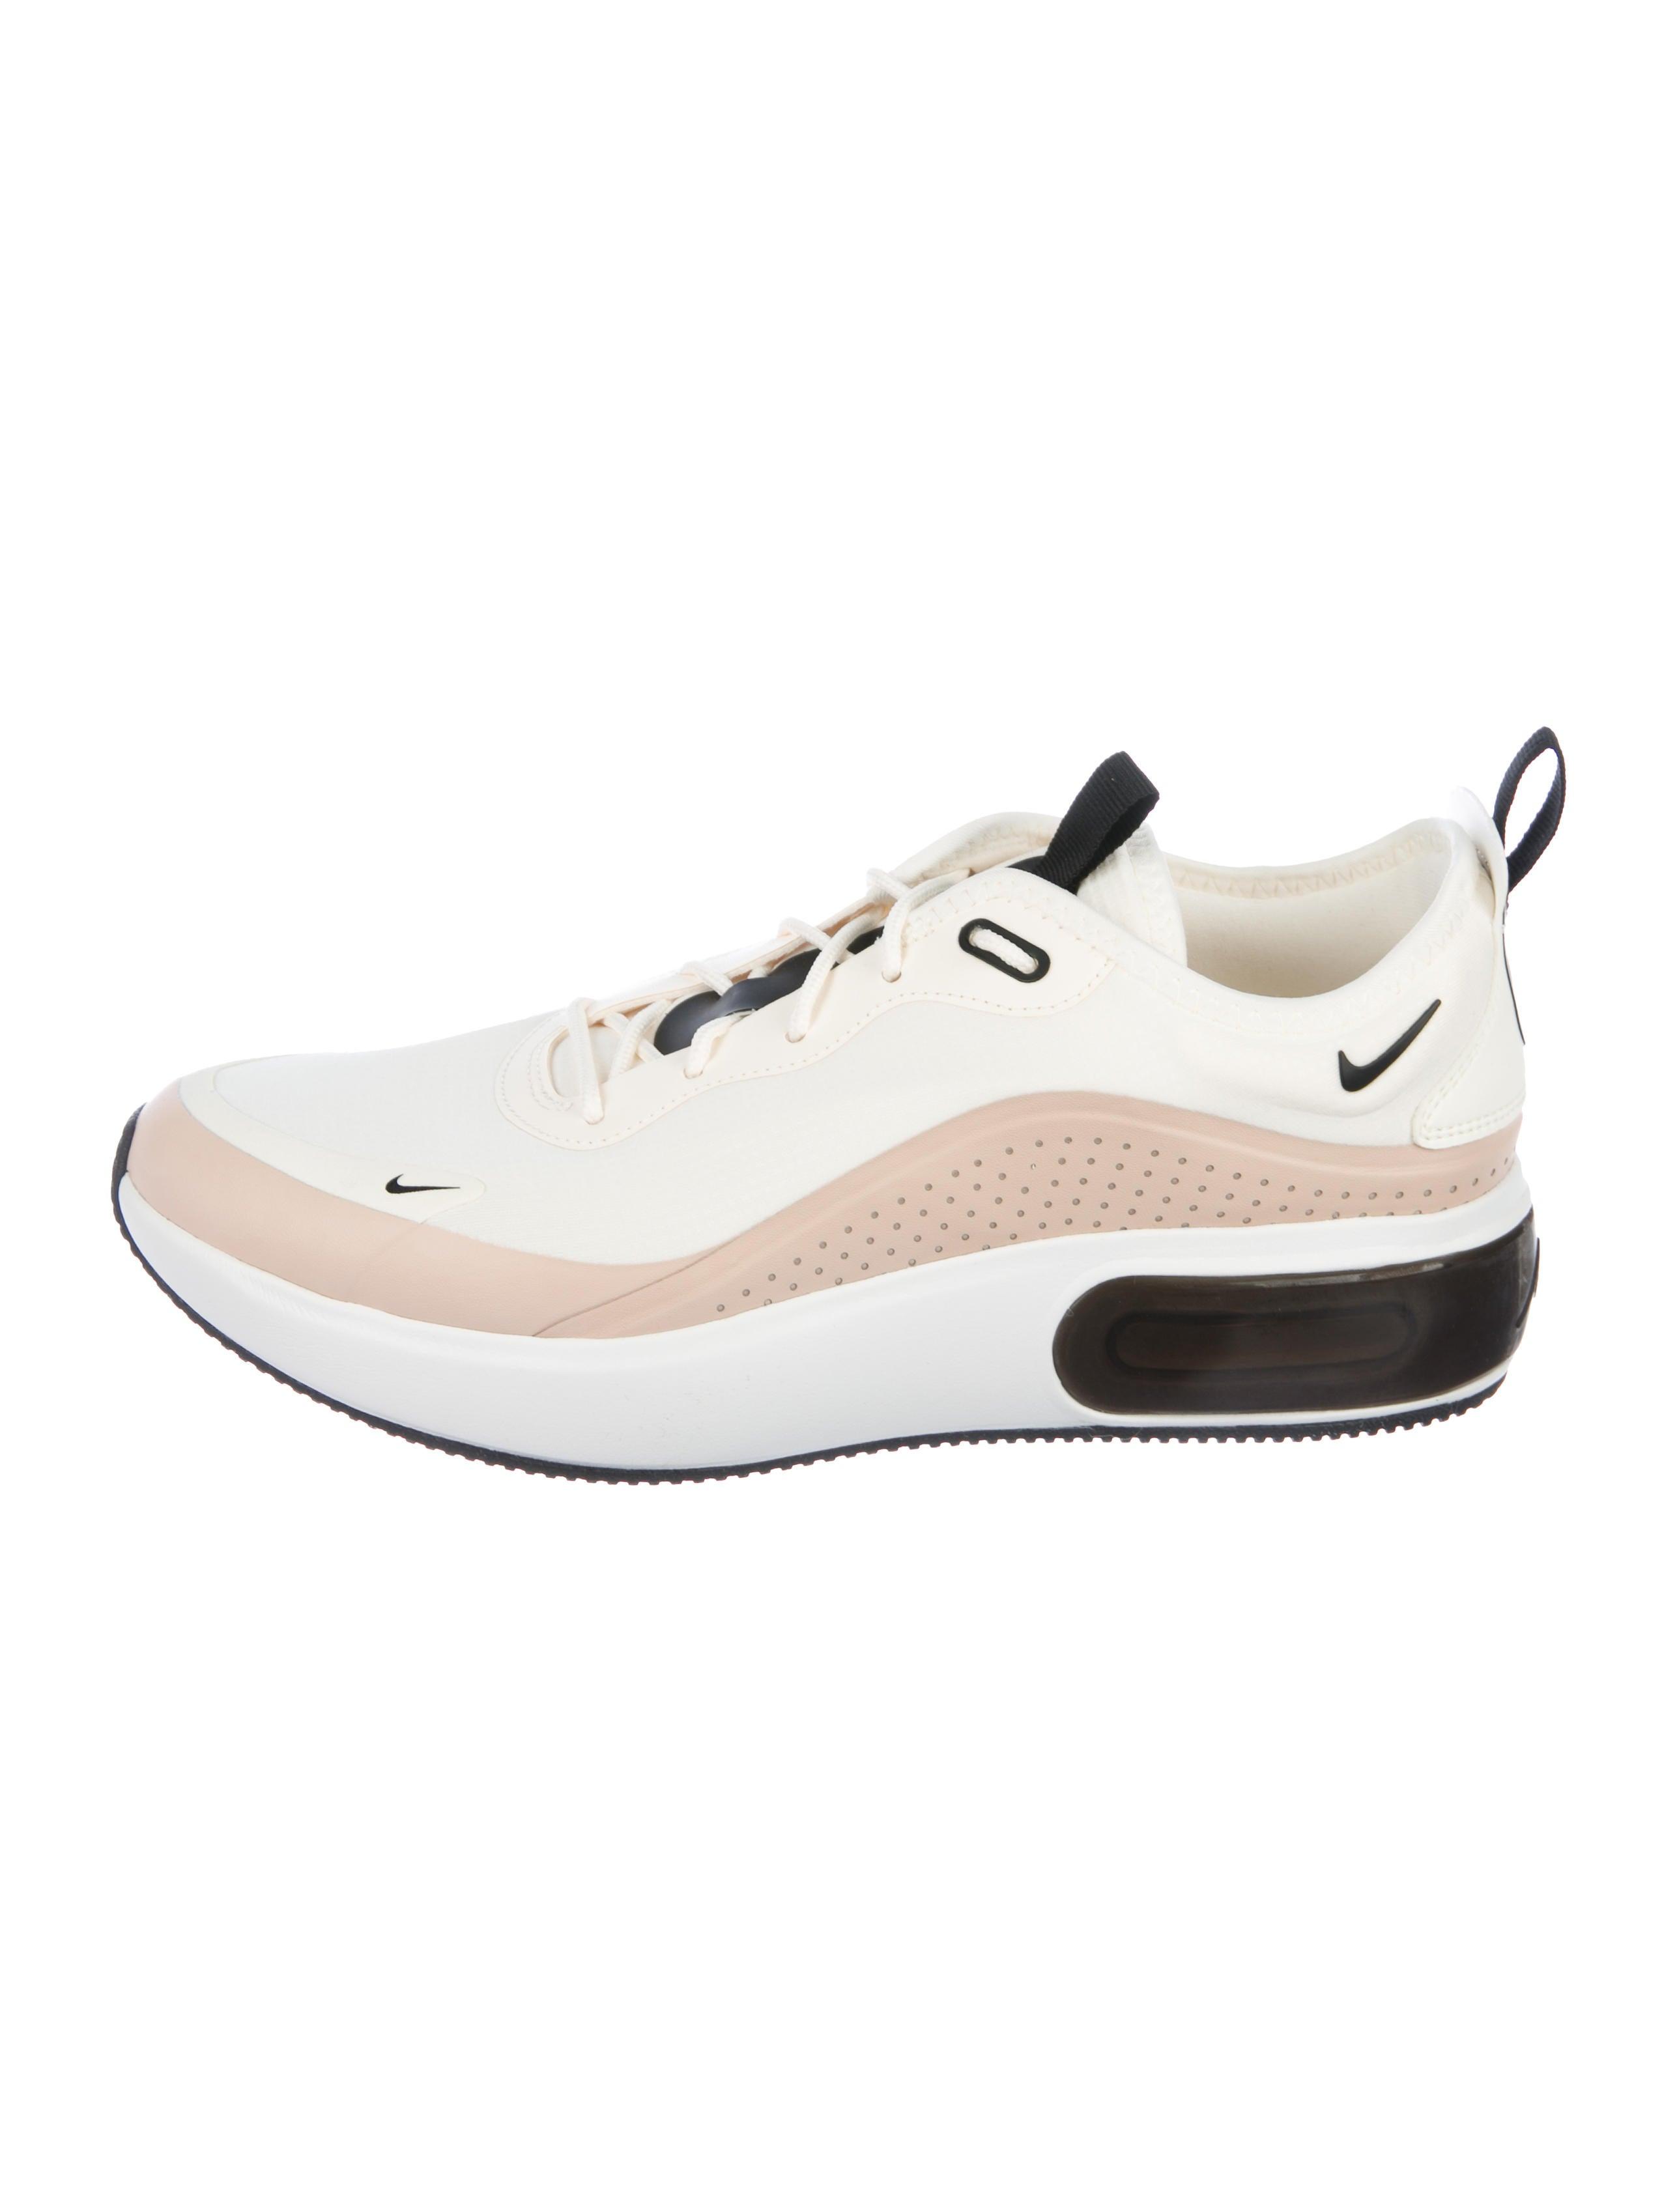 Nike 2019 Air Max Dia Pale Ivory